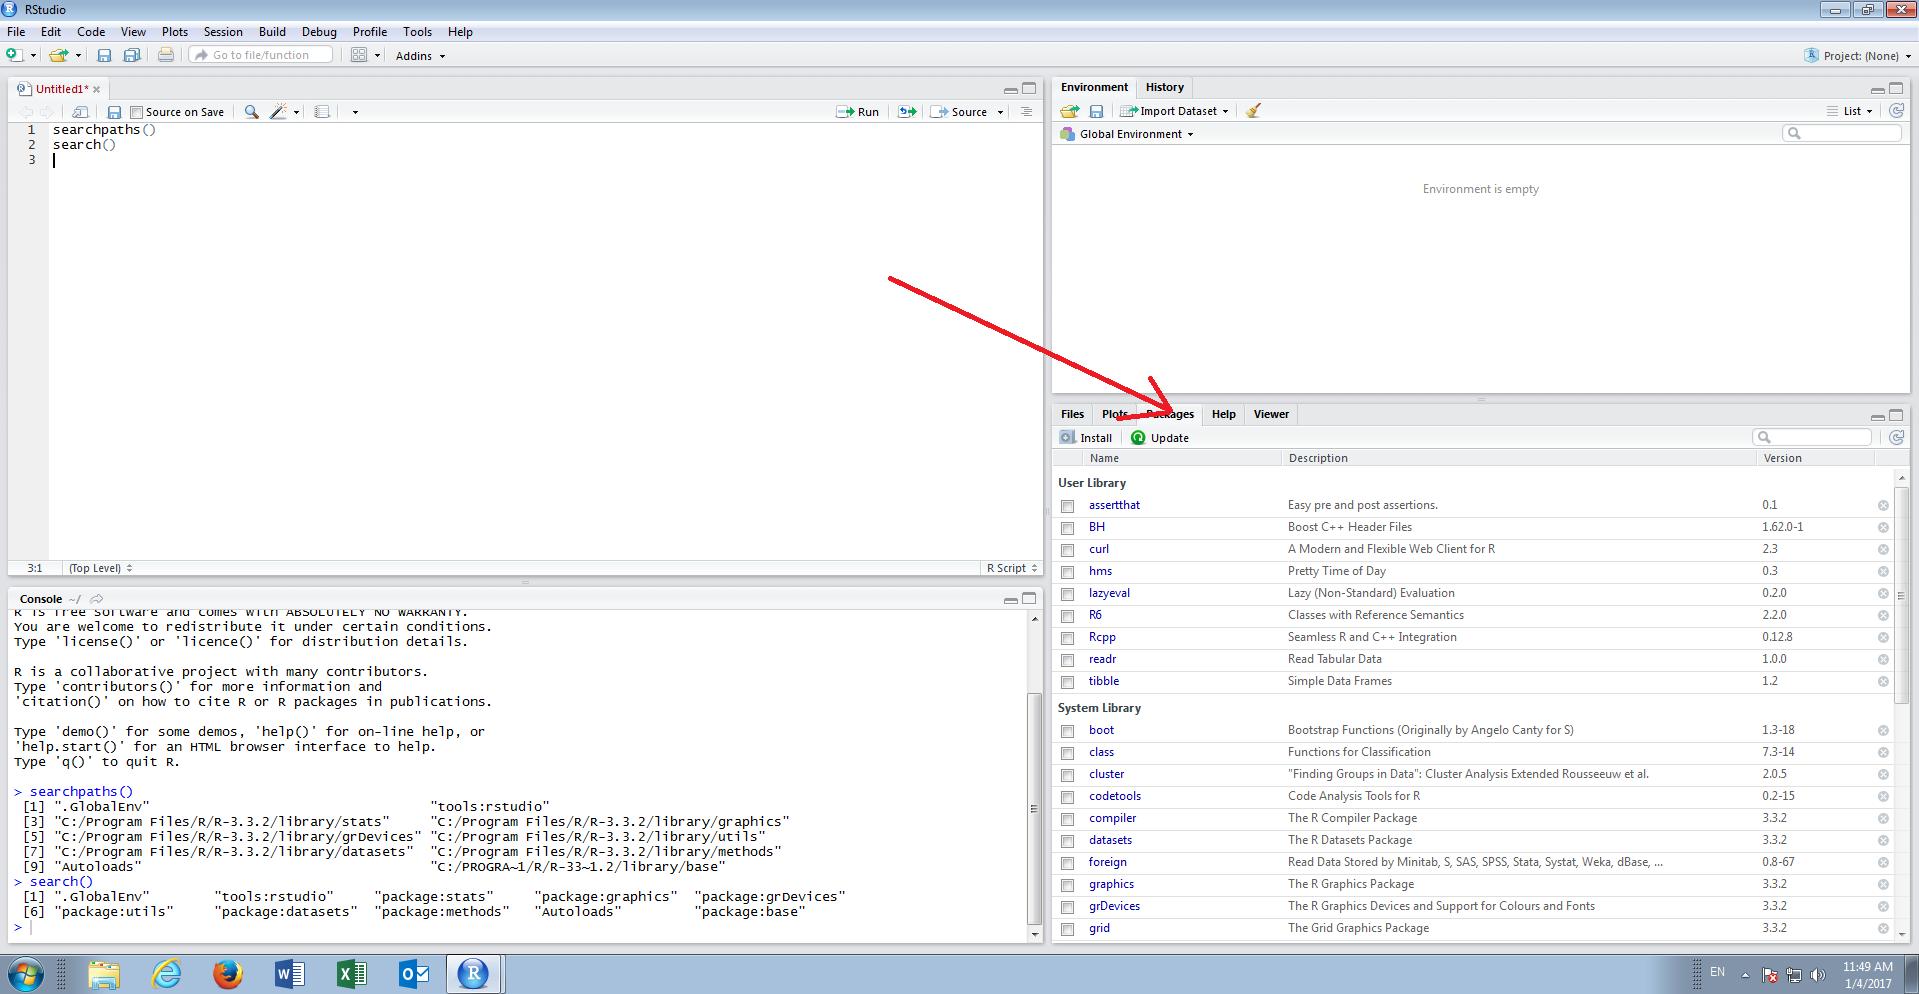 packages-window-in-rstudio.png